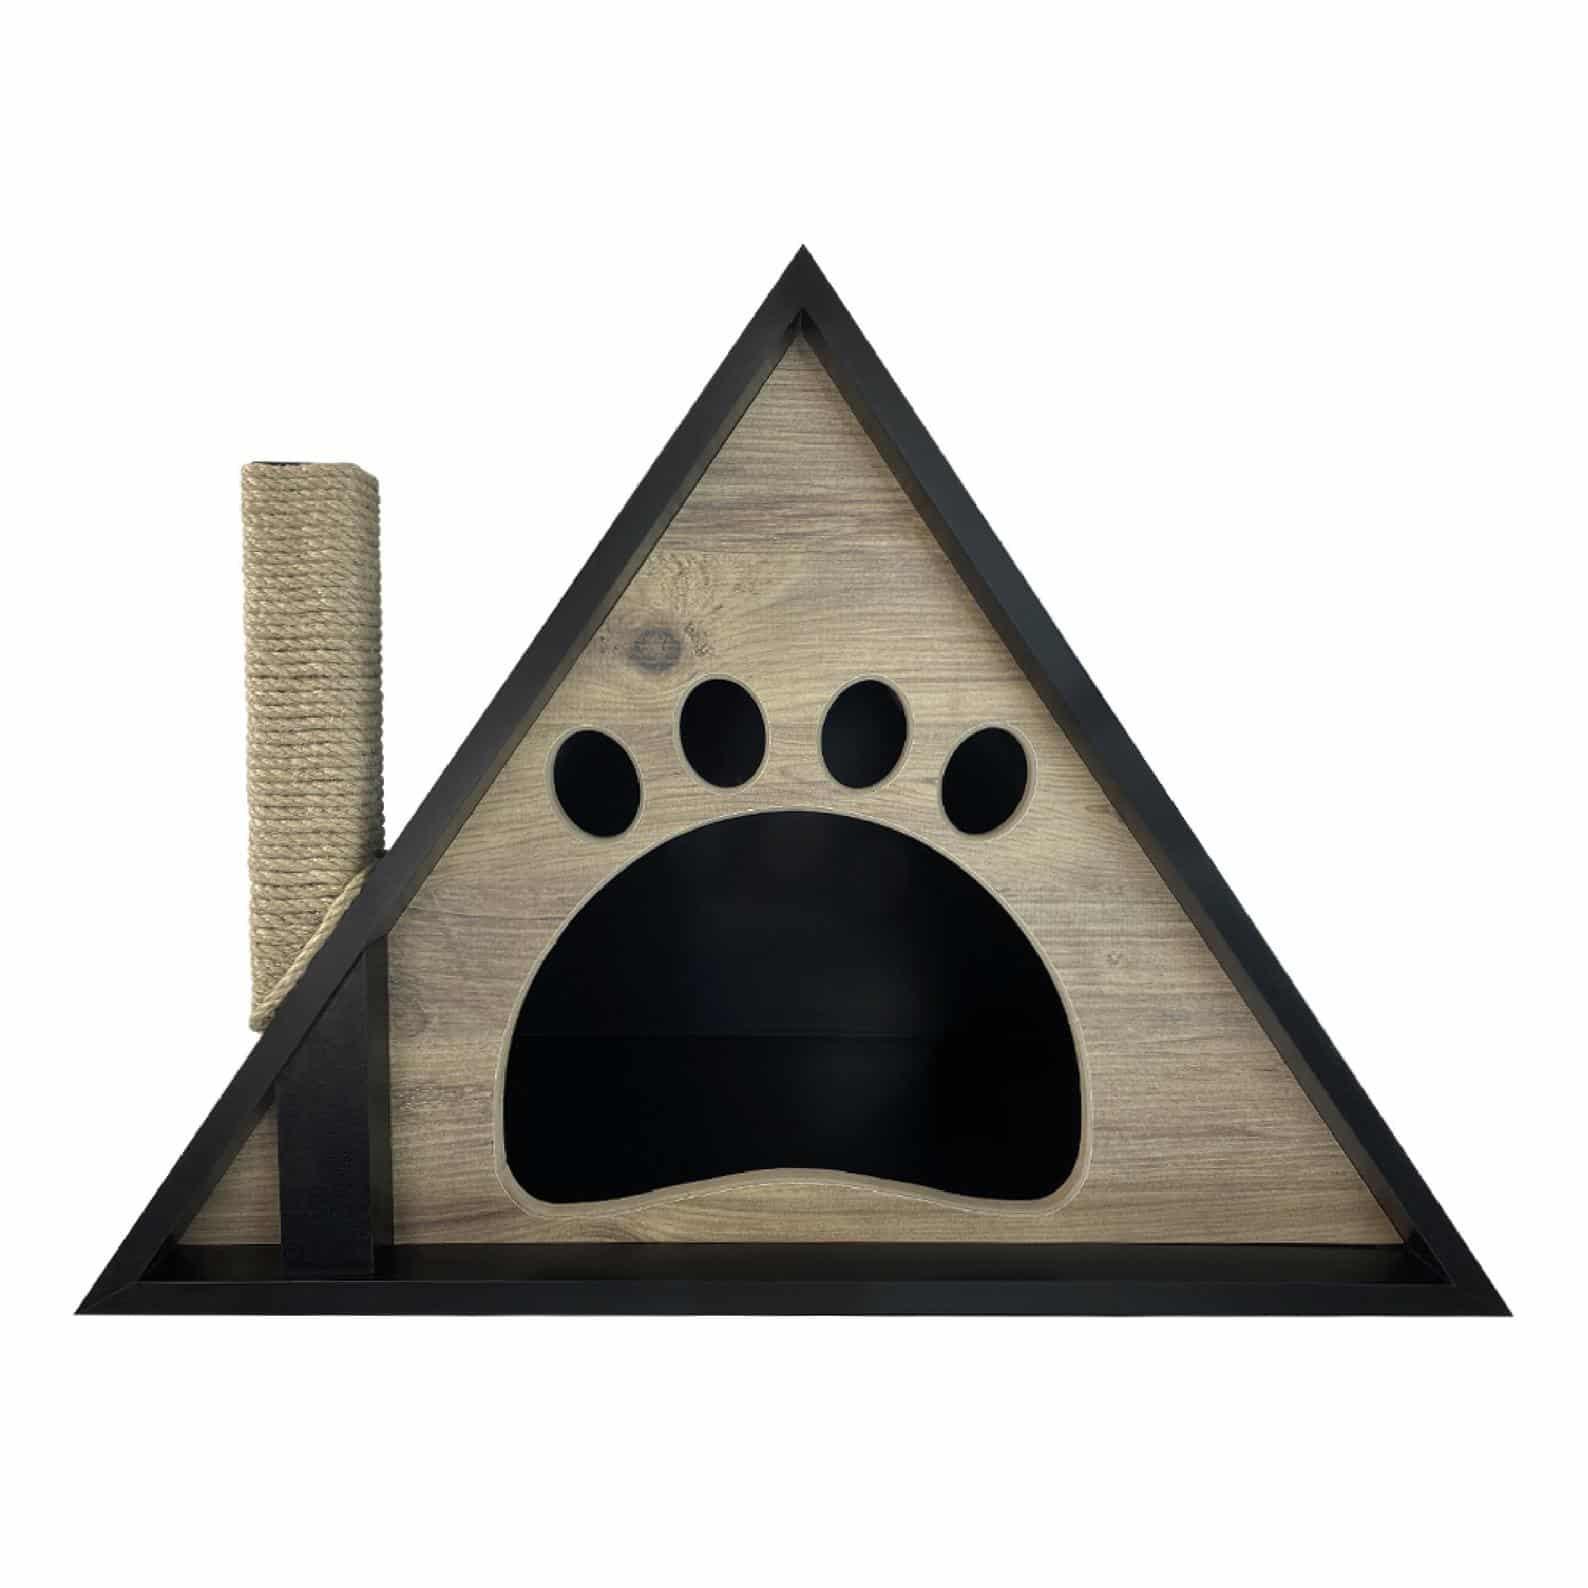 maison niche triangle motif cheminee